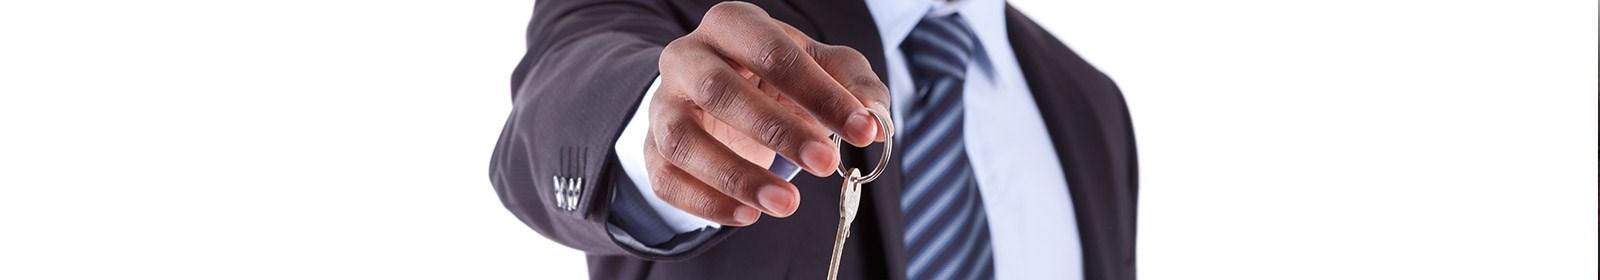 10 characteristics of successful estate agents